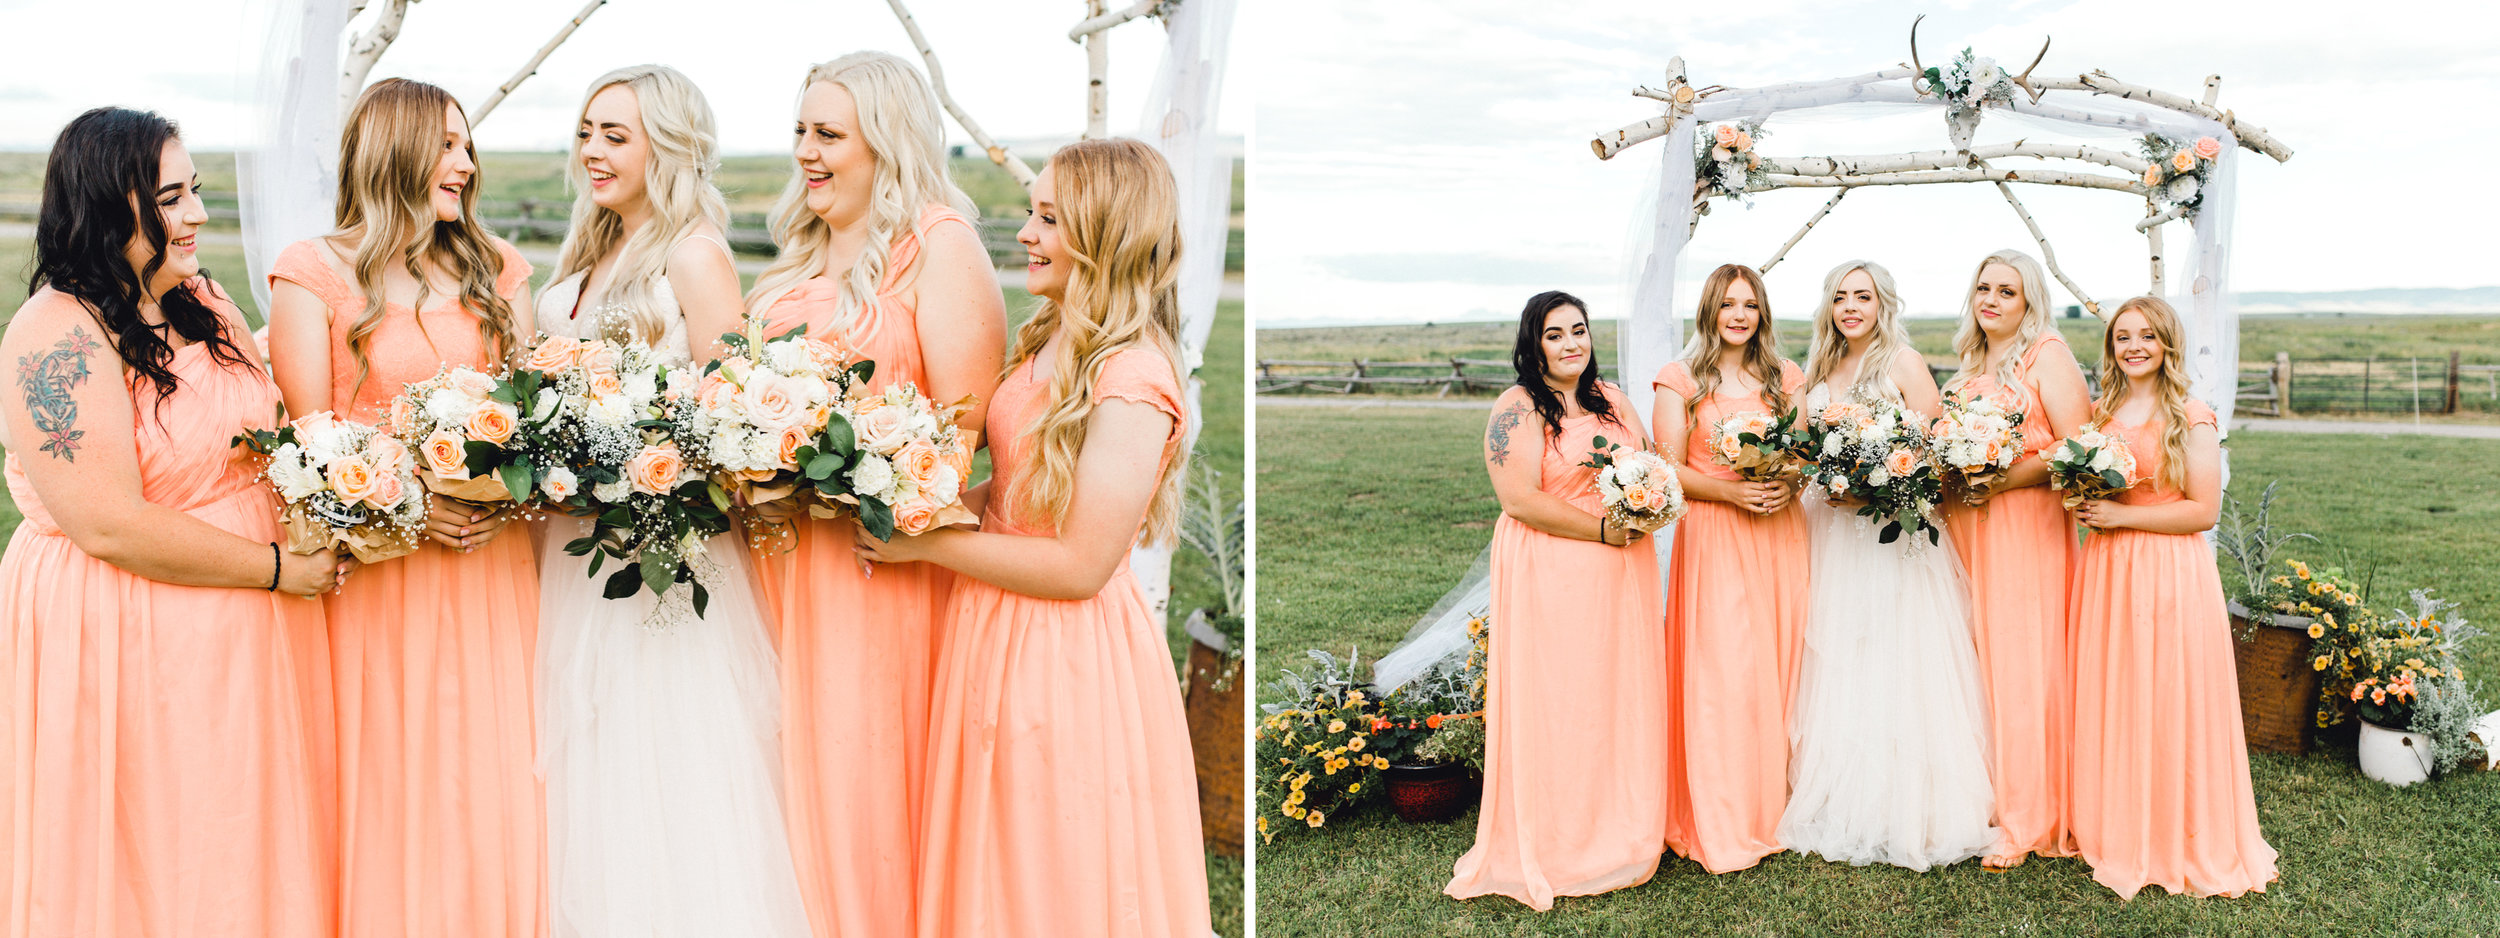 country-outdoor-rustic-wedding-tetons-idaho-anna-christine-photo-26.jpg